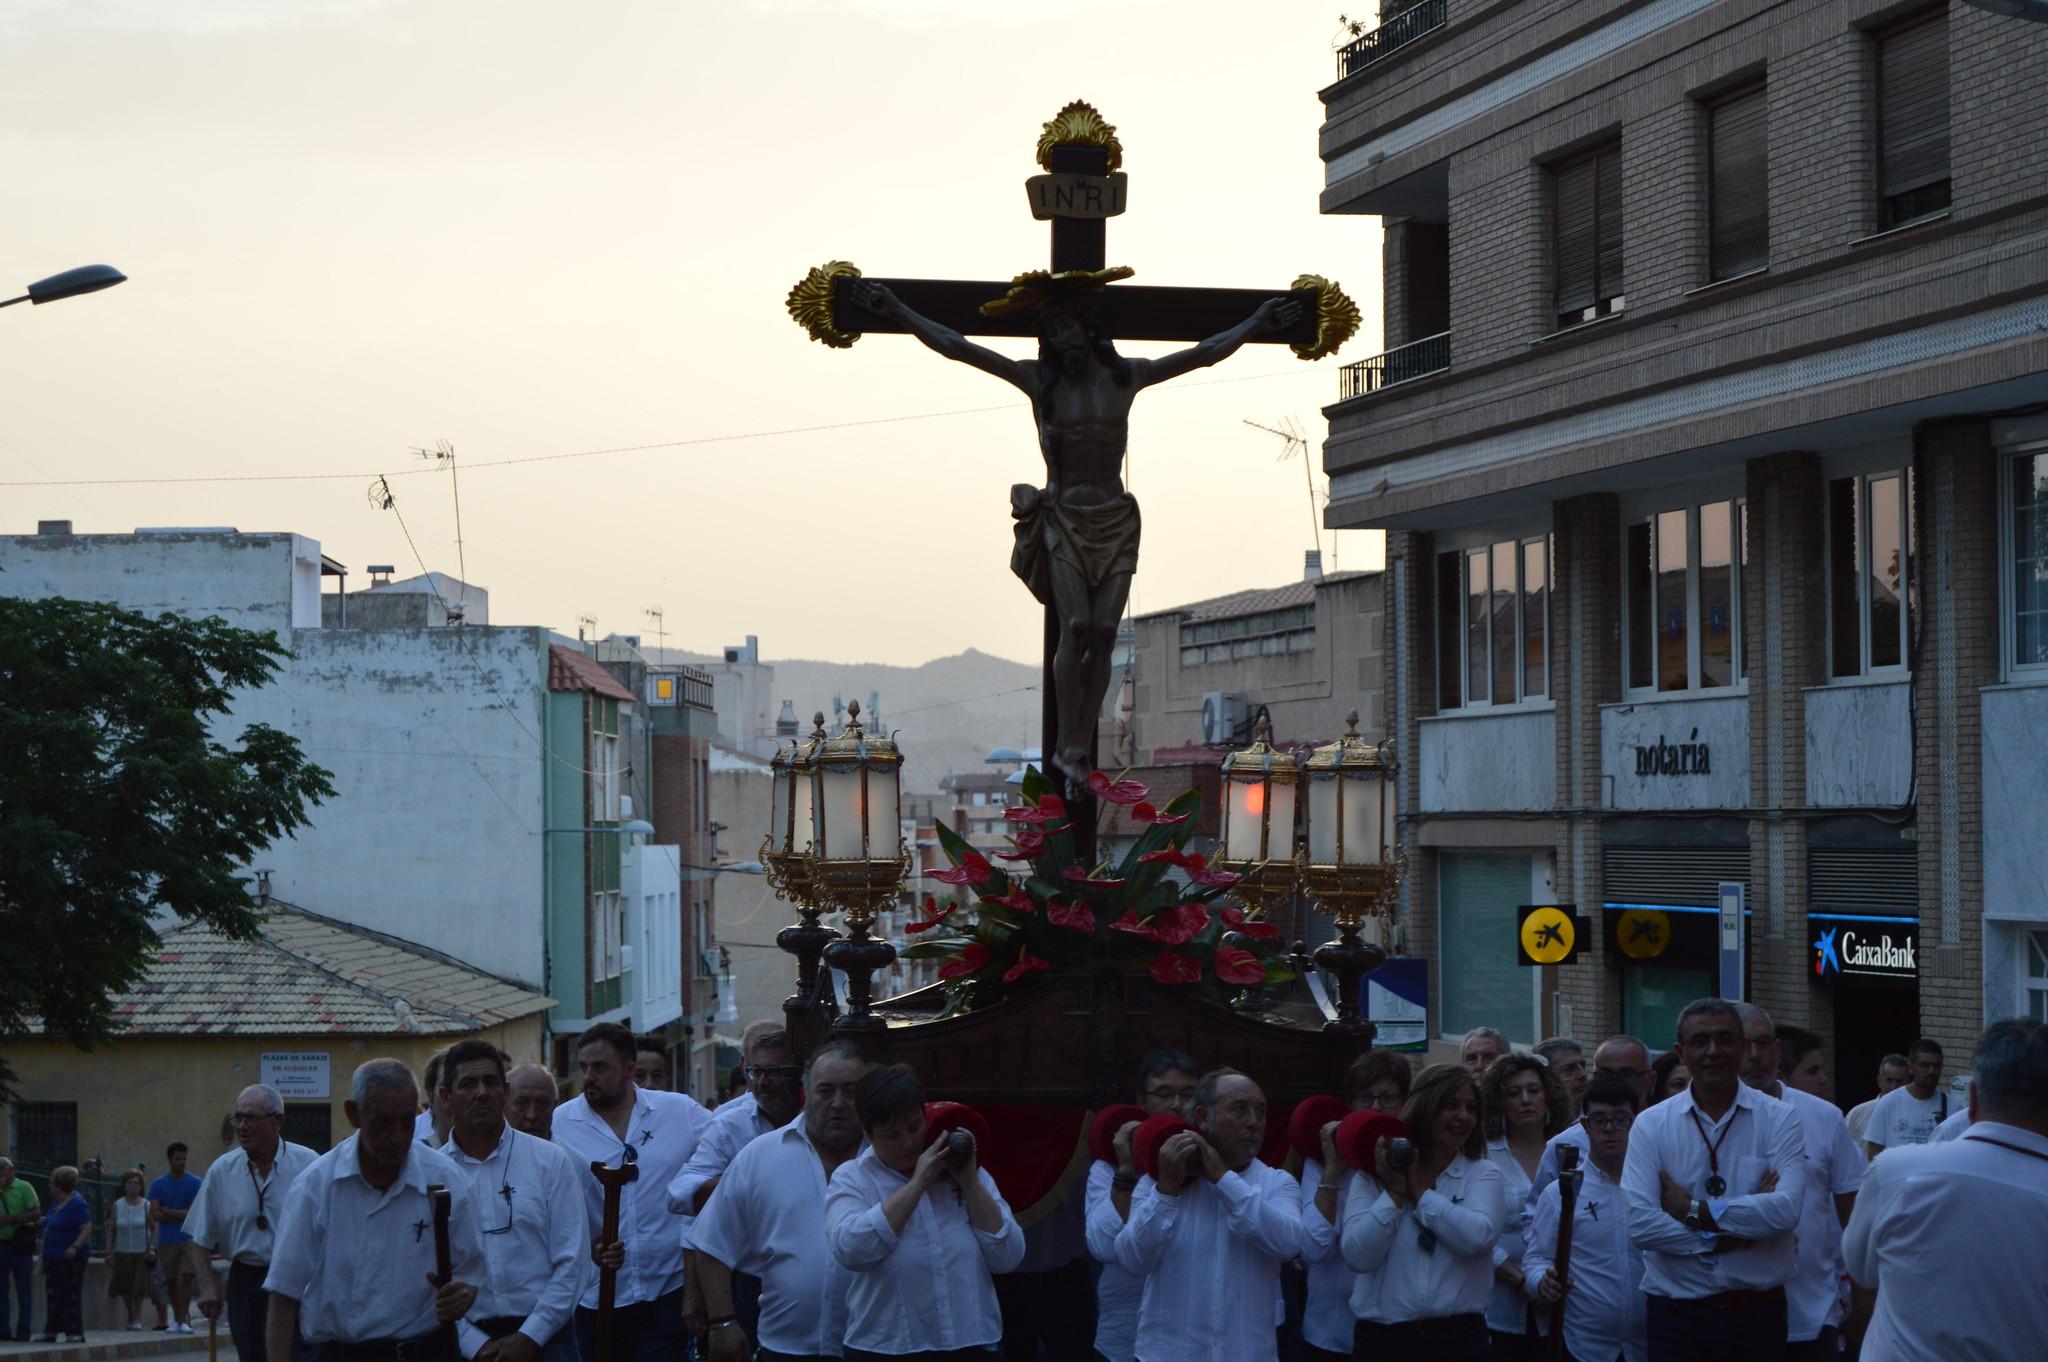 (2019-07-07) Procesión de subida - Adrián Romero Montesinos (13)